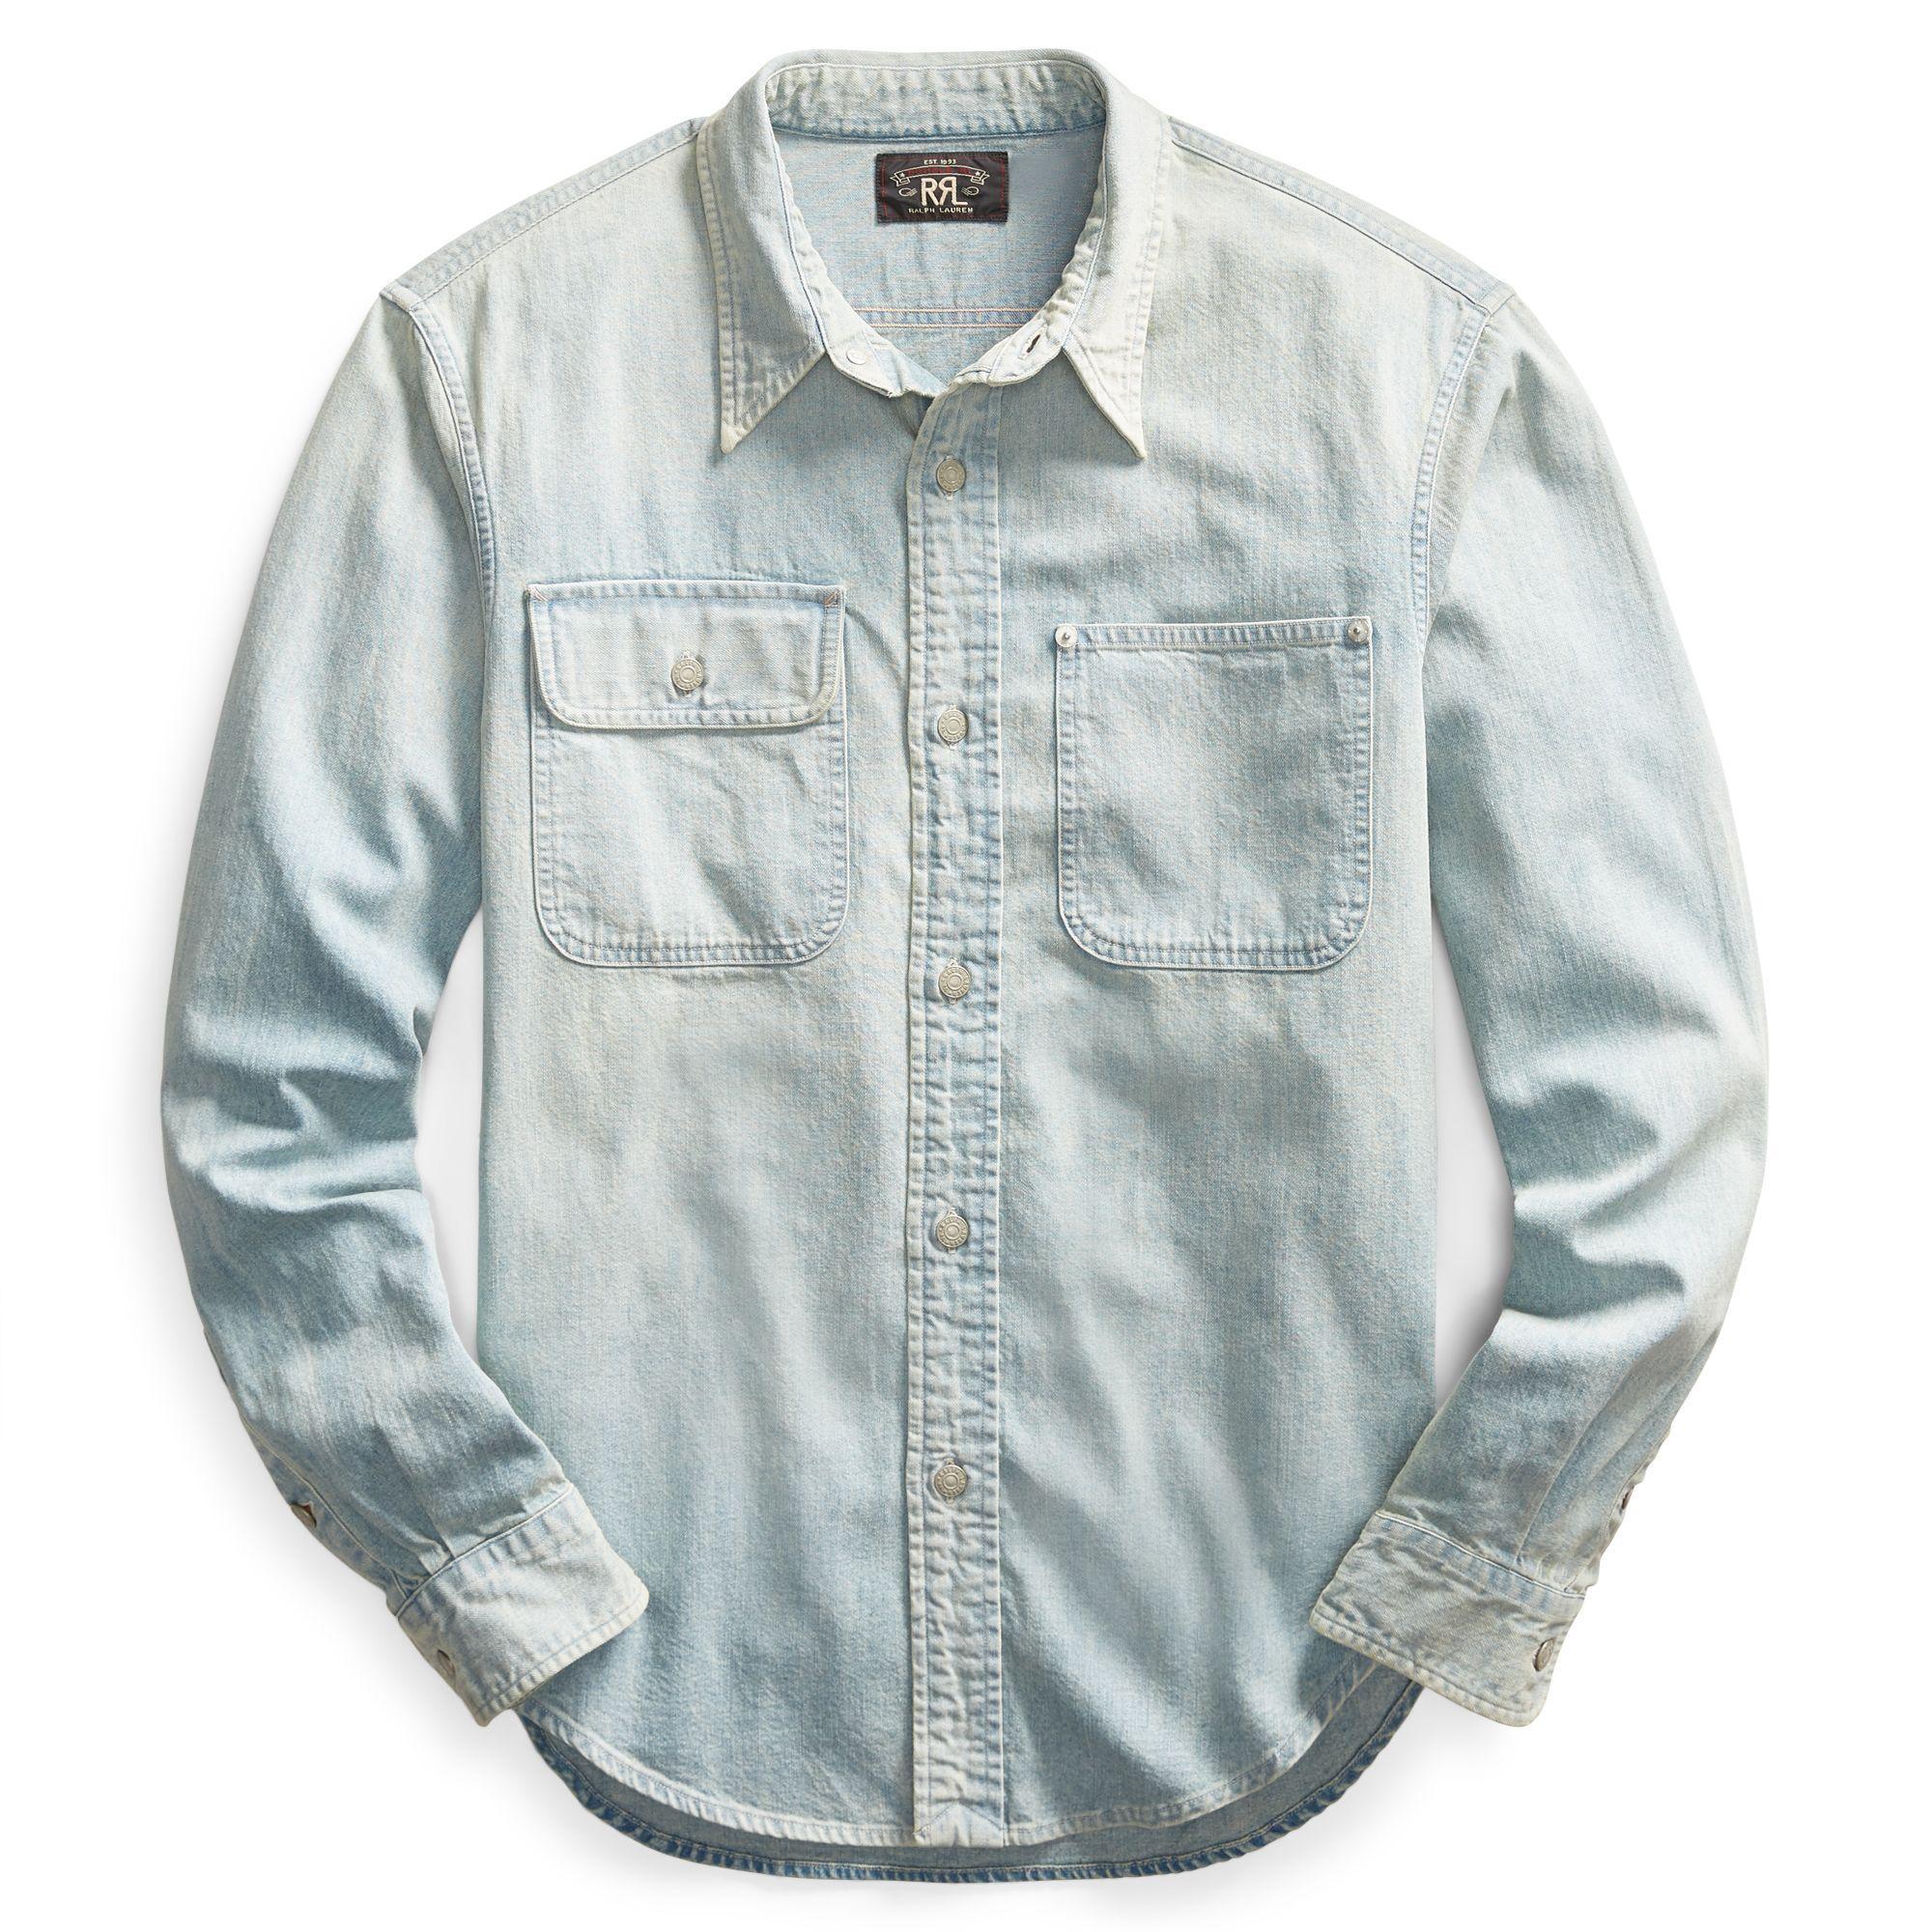 4e986e61 RRL - Blue 25th Anniversary Denim Shirt for Men - Lyst. View fullscreen